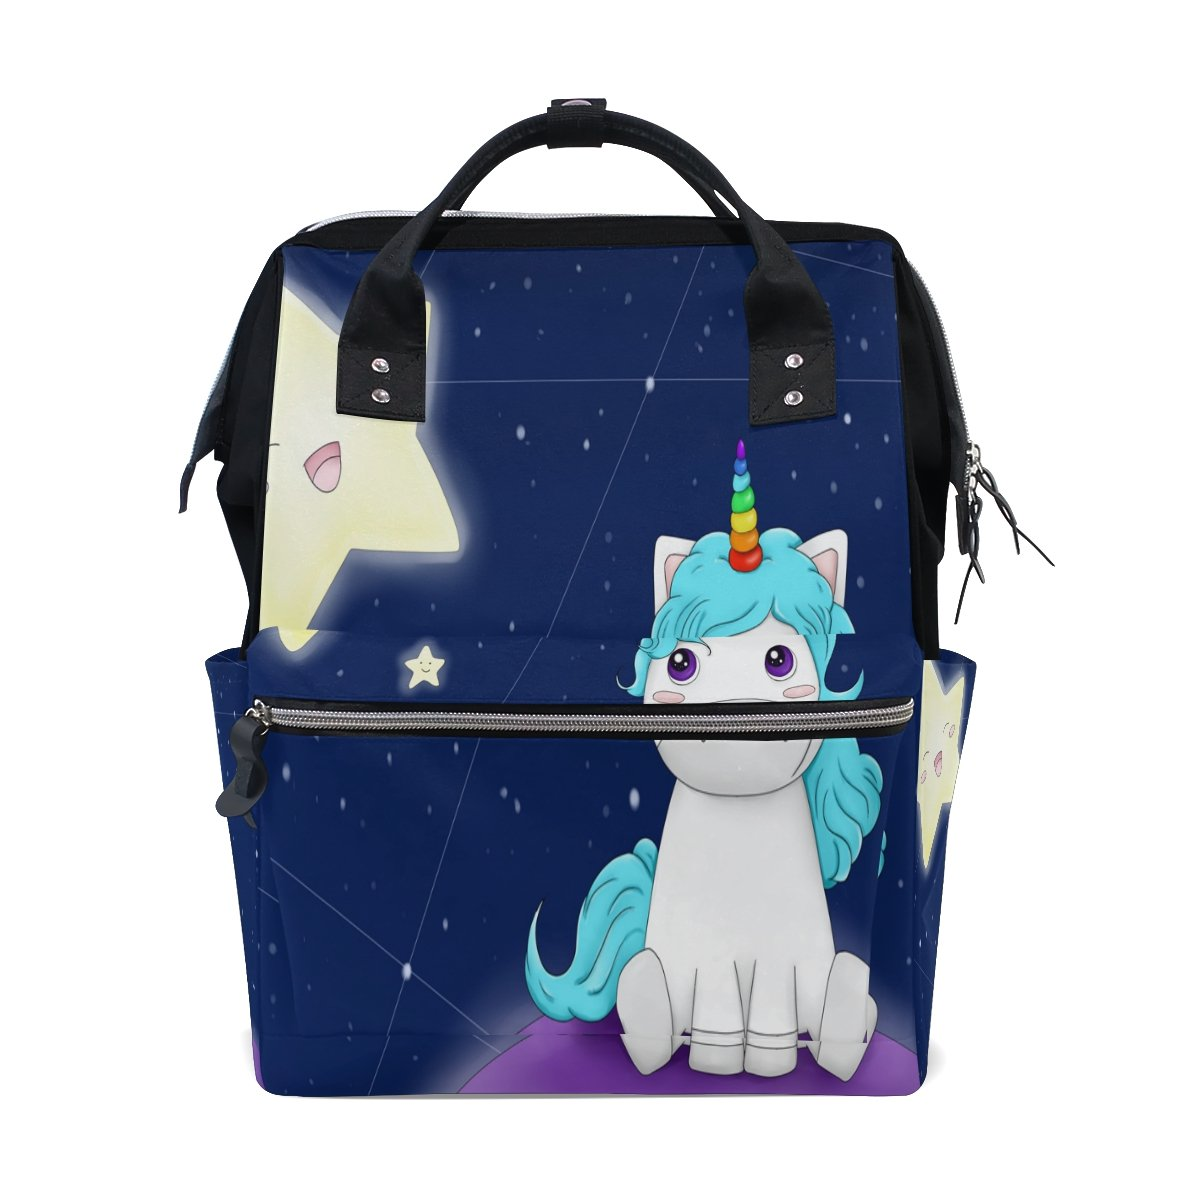 FENNEN Unicorn Horse Travel School Backpack Casual College Lightweight Laptop Backpack Large Capacity Shoulder Diaper Bag for Women Men